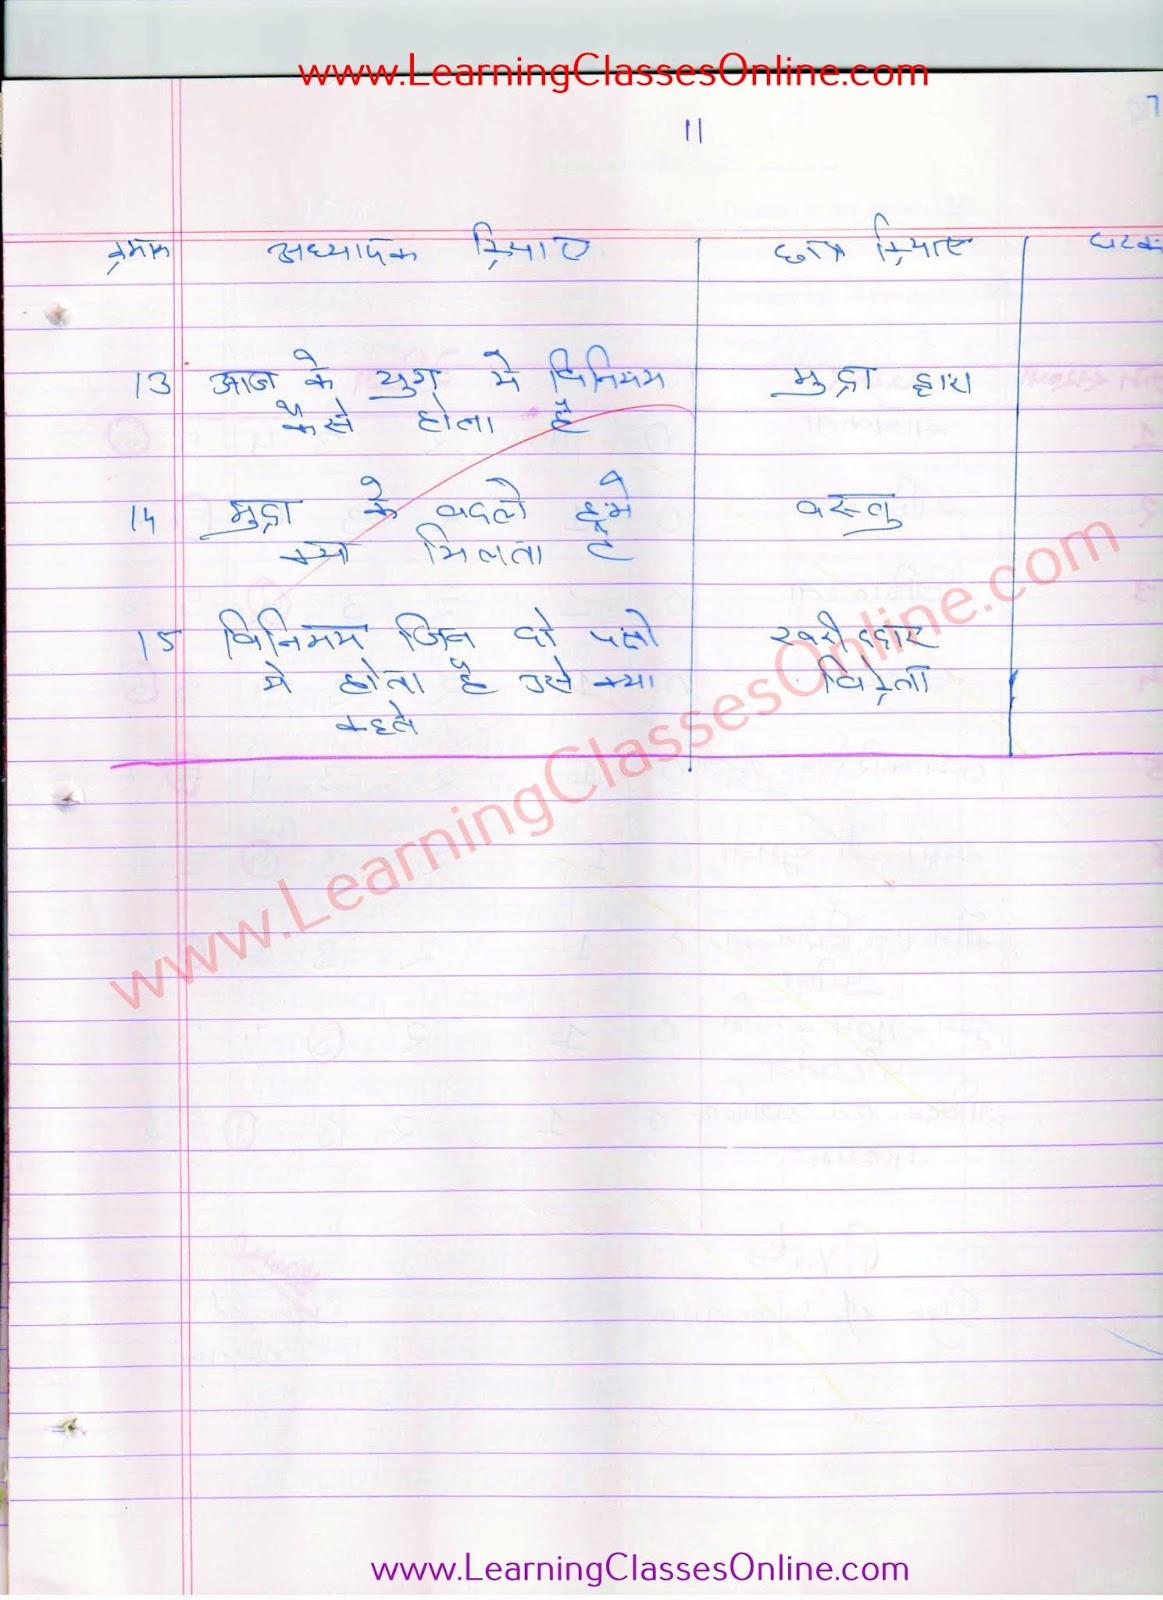 mudra lesson plan of economics in hindi